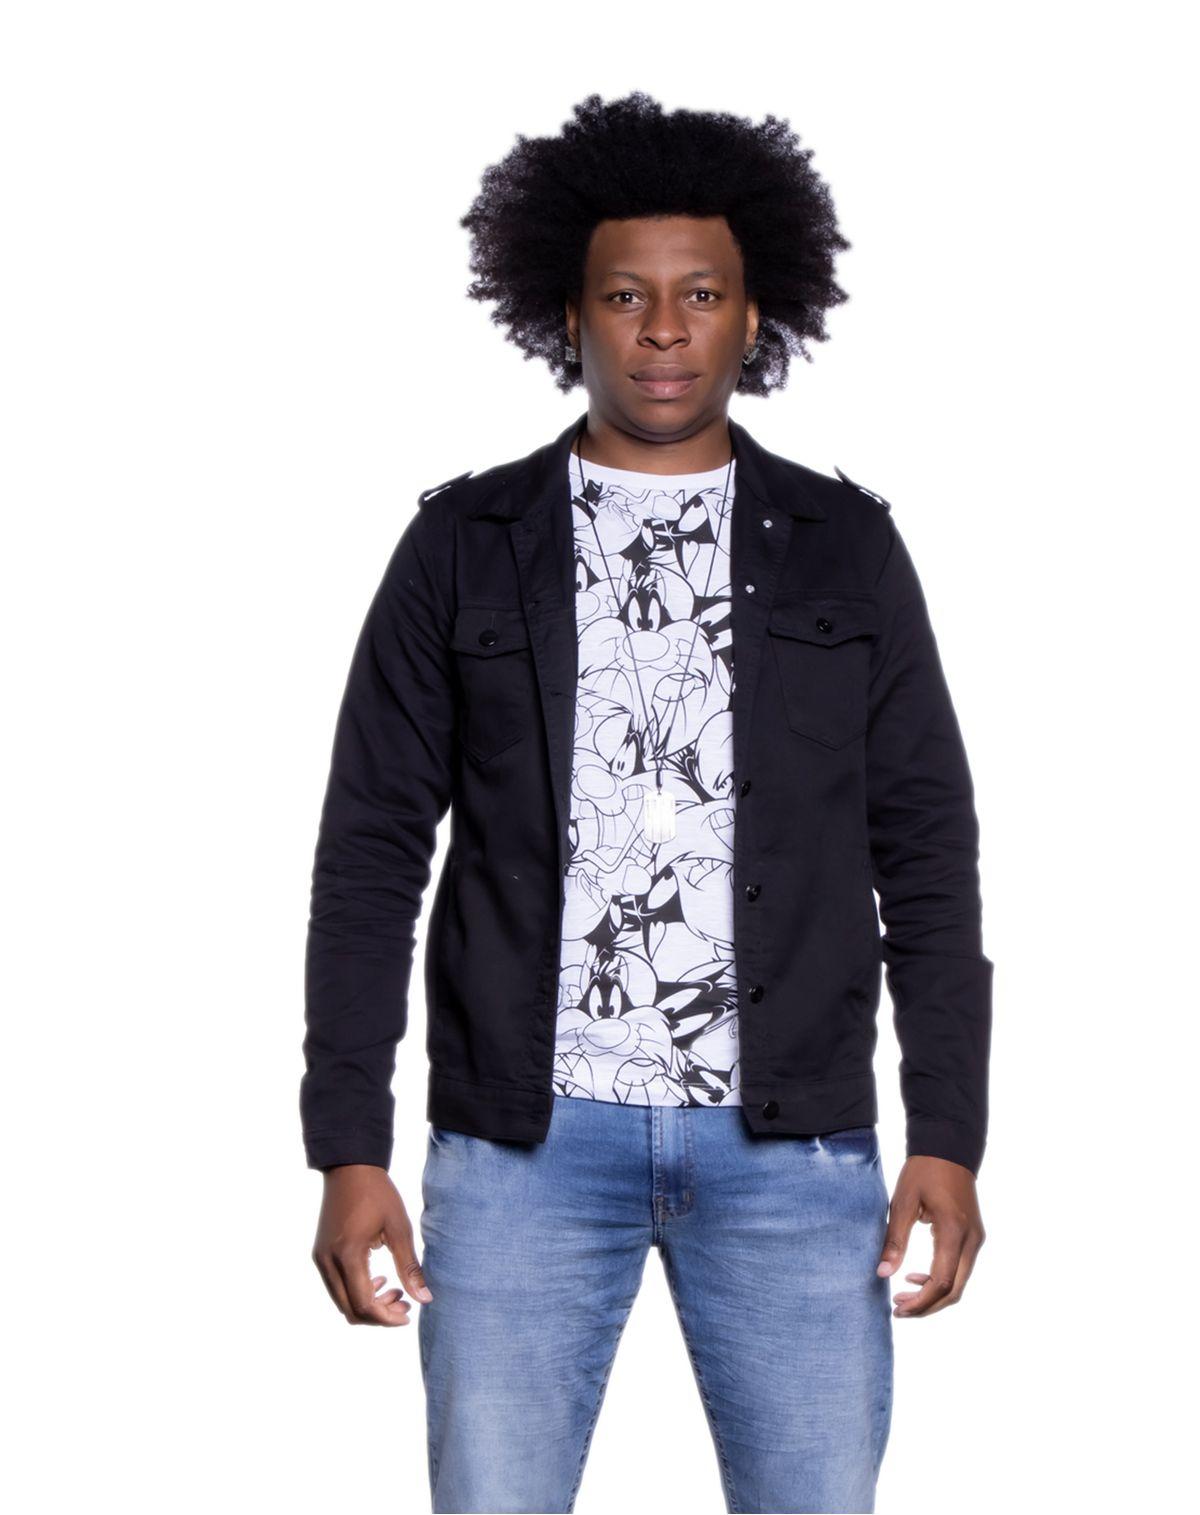 593383003-jaqueta-sarja-basica-black-masculina-bolsos-preto-g-216